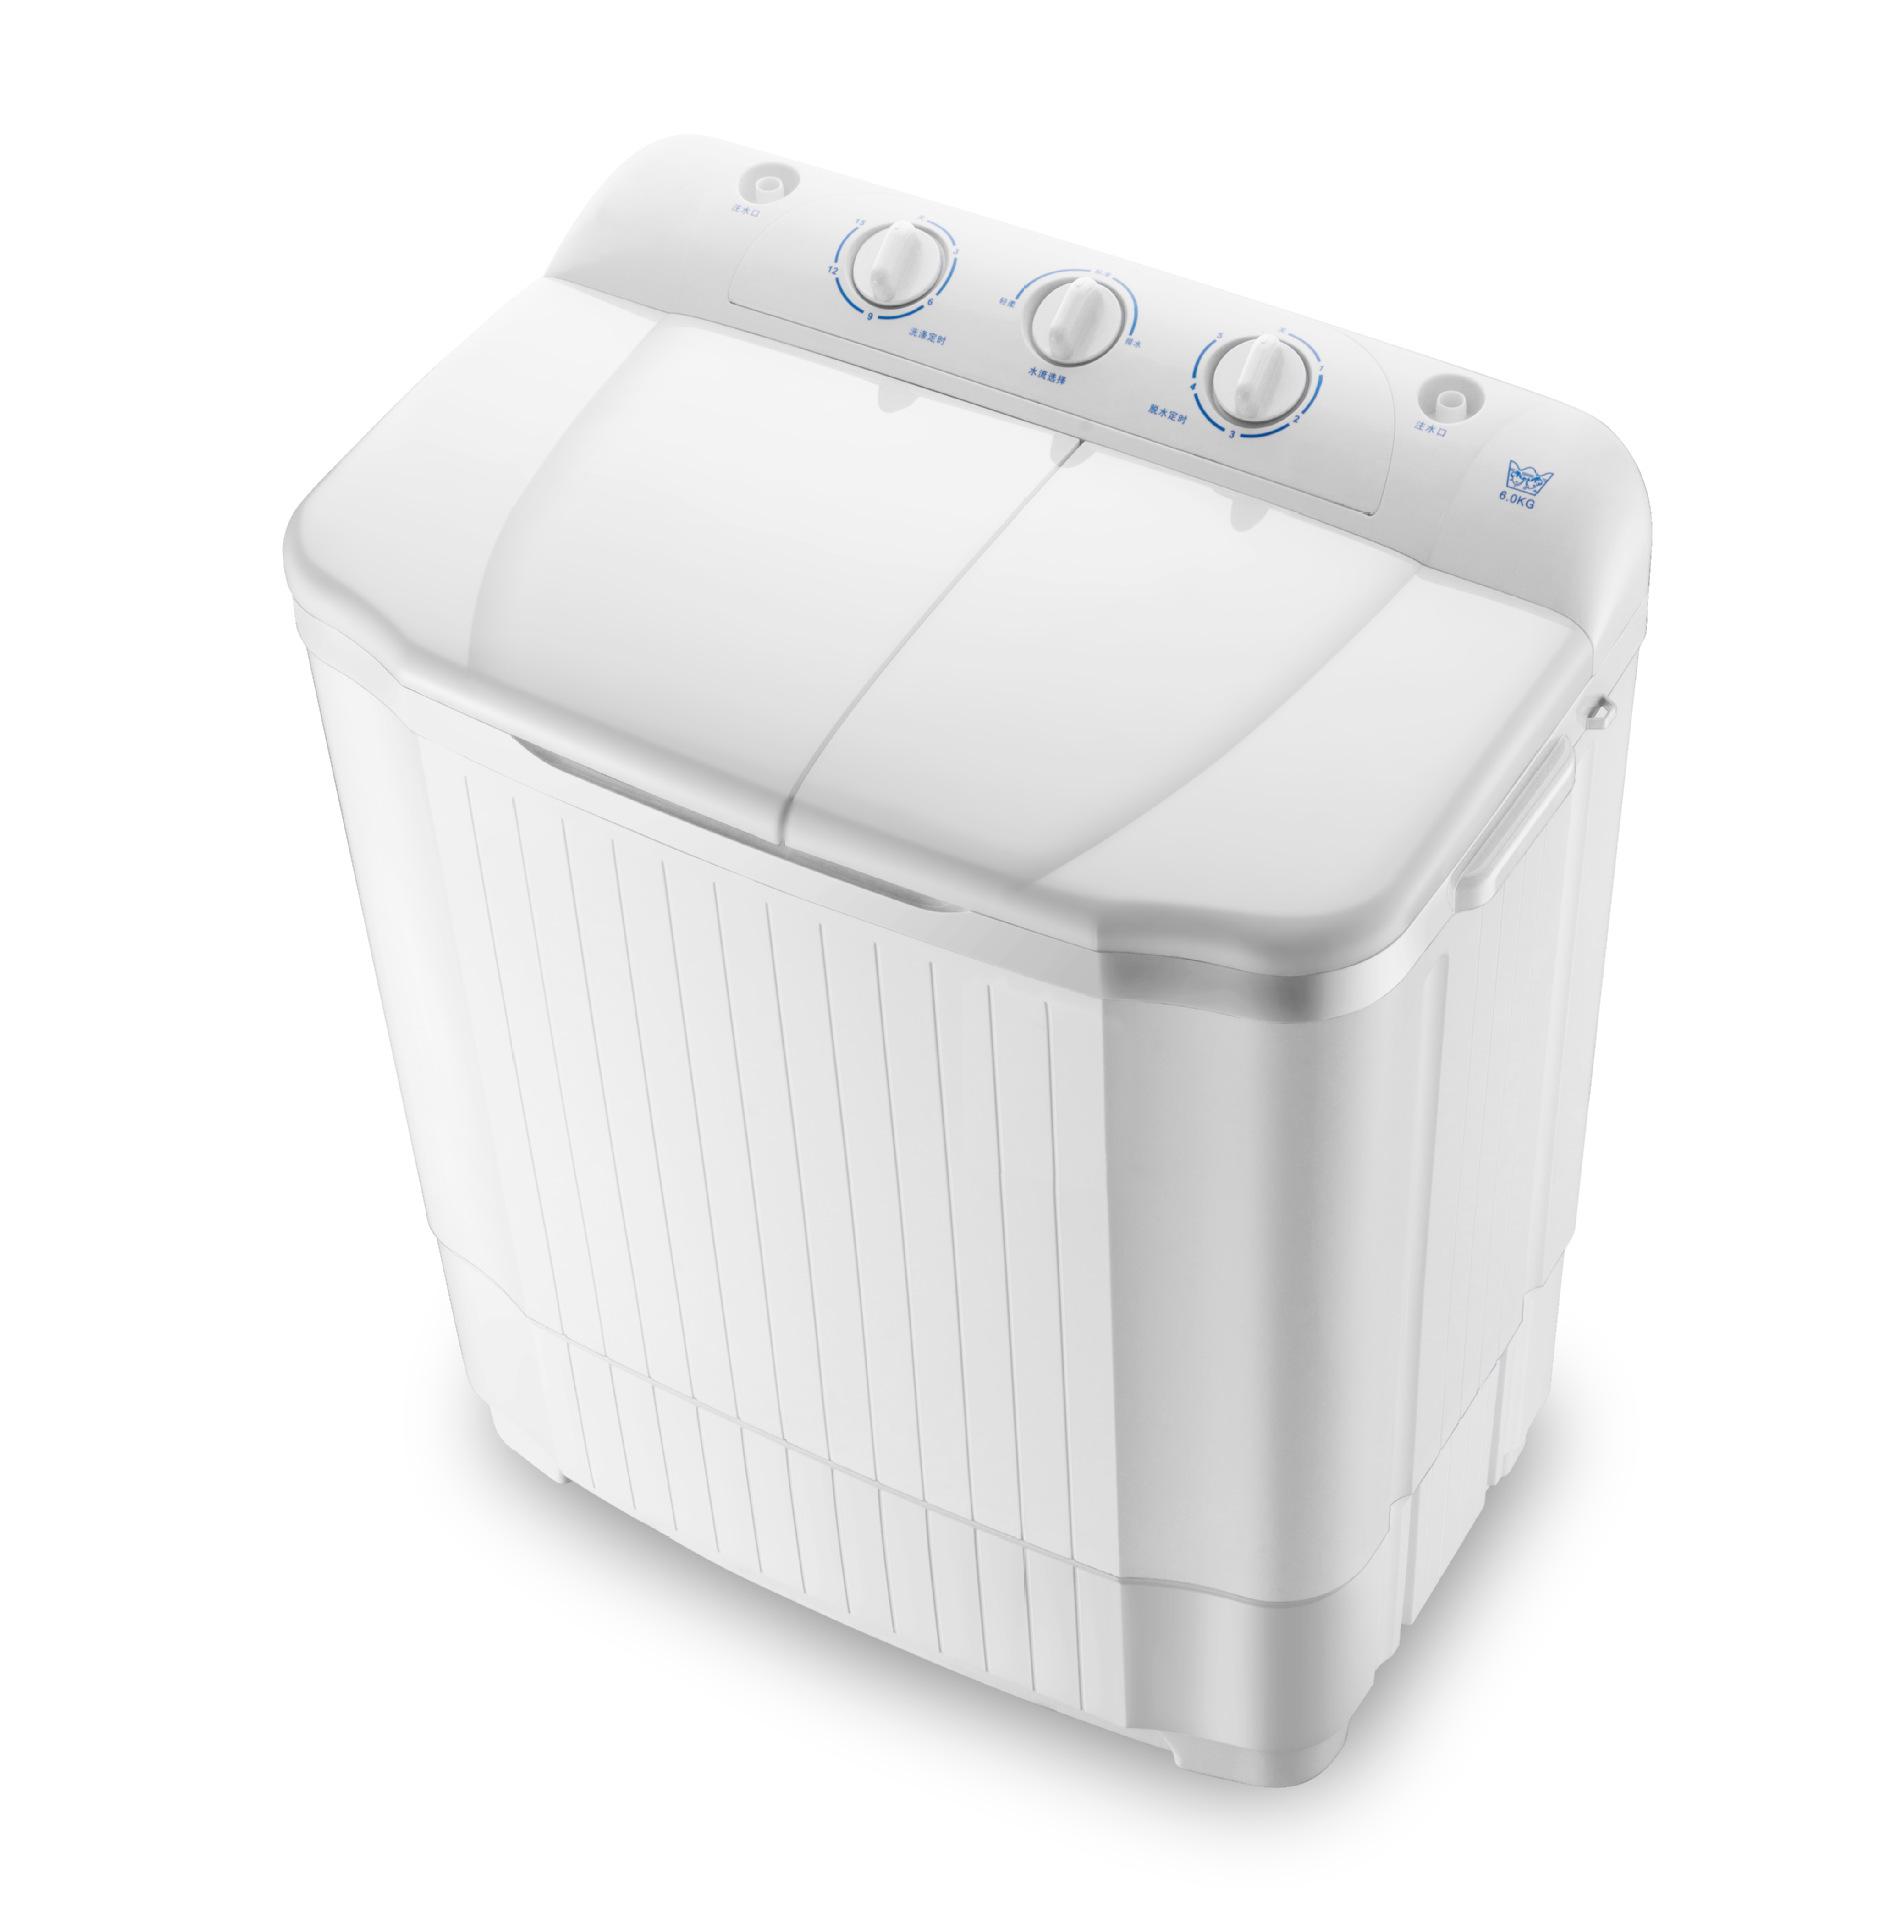 Shenhua 6.2 kg double-cylinder impeller washing machine semi-automatic double-barrel dehydrating was